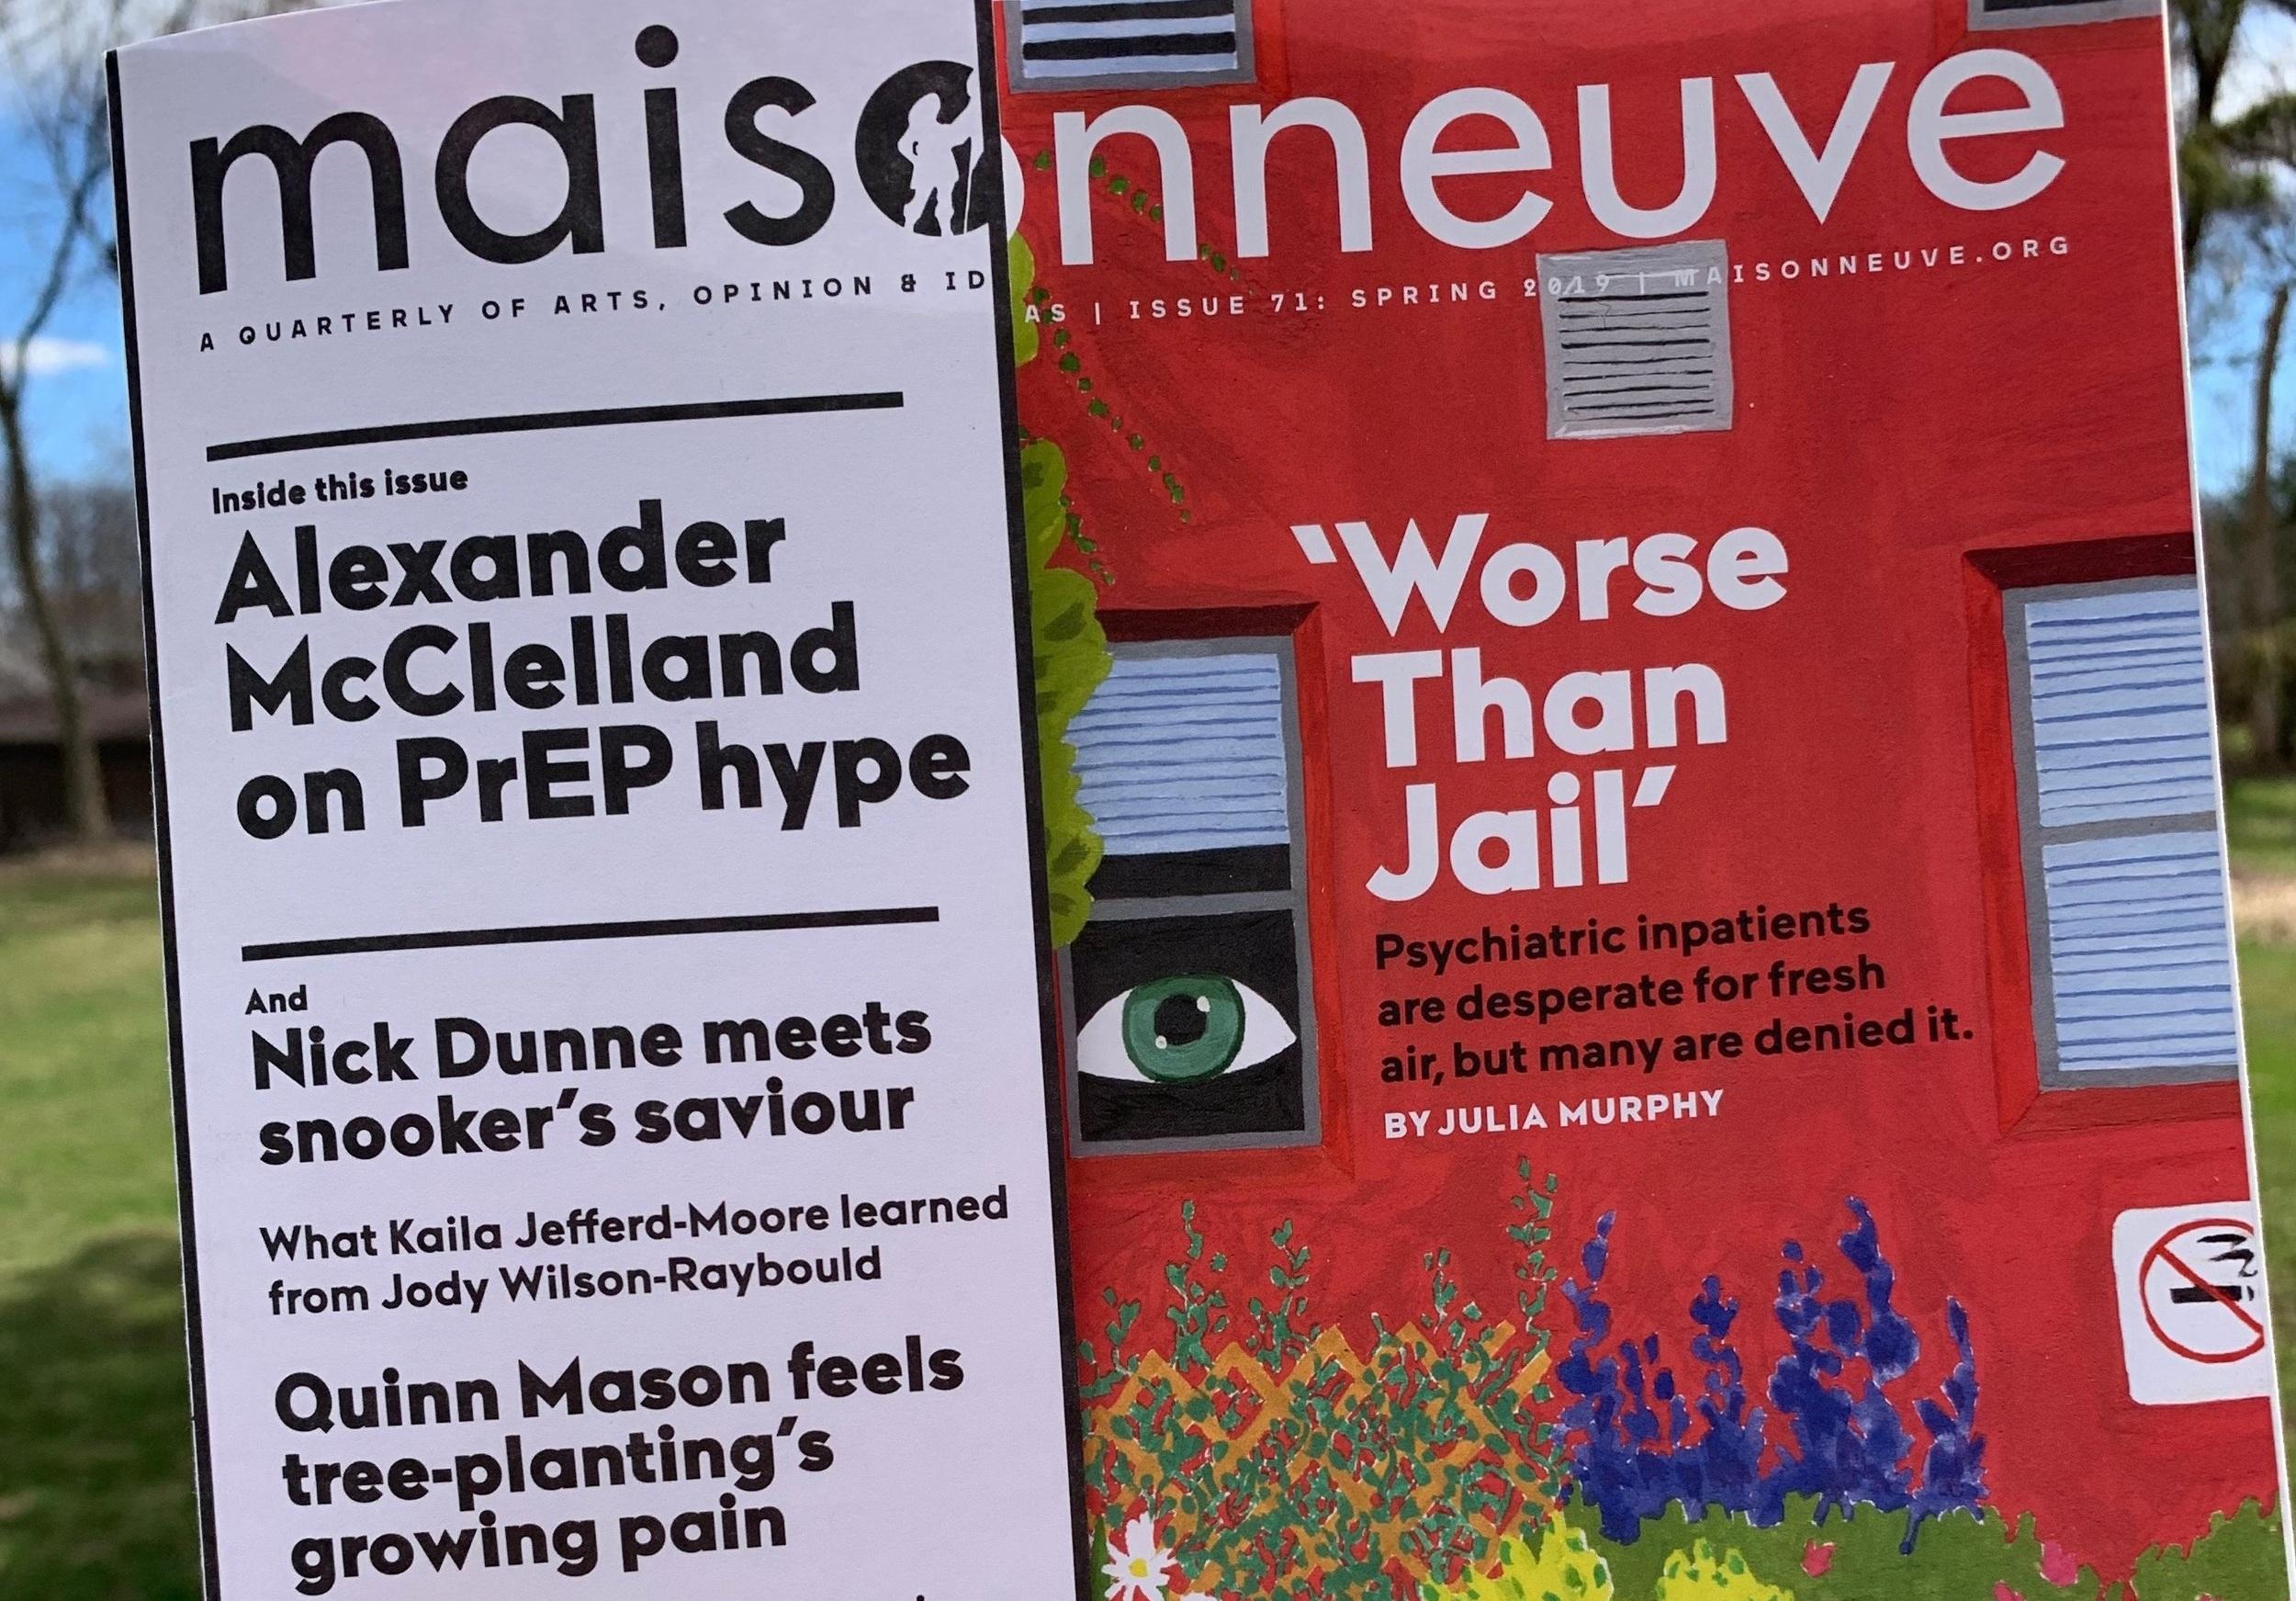 Maisonneuve magazine—Spring 2019